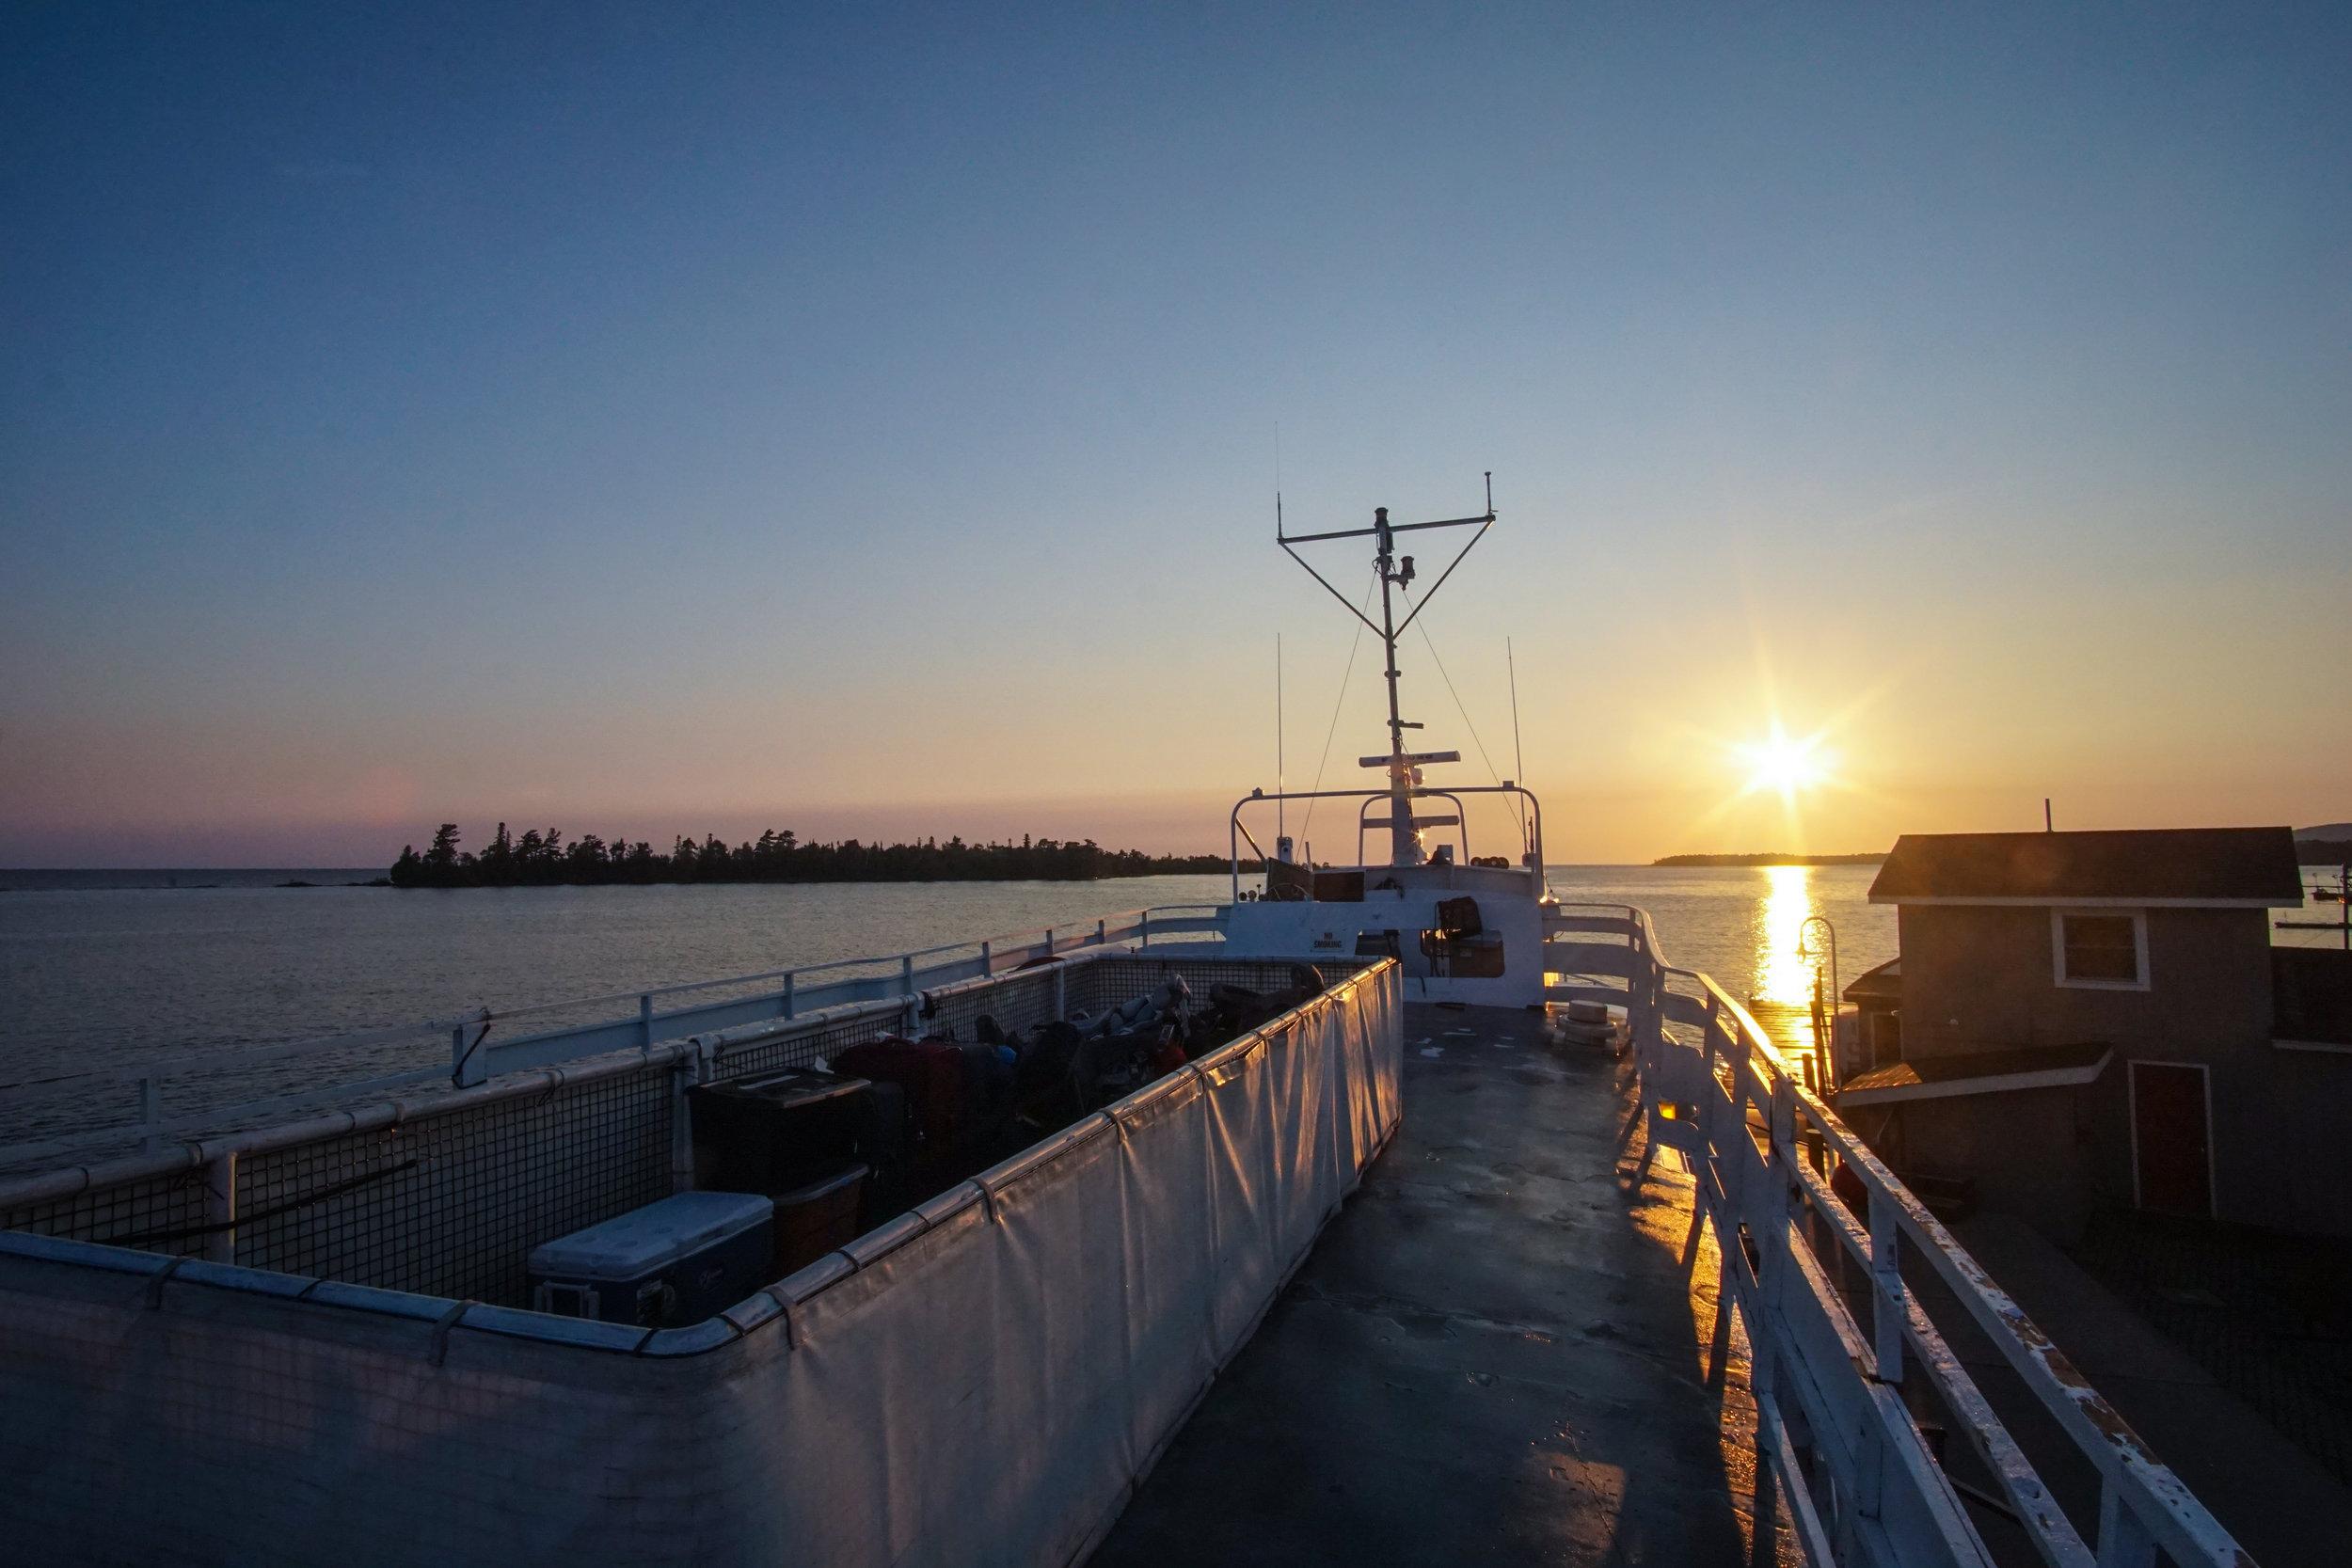 Sunrise over Copper Harbor